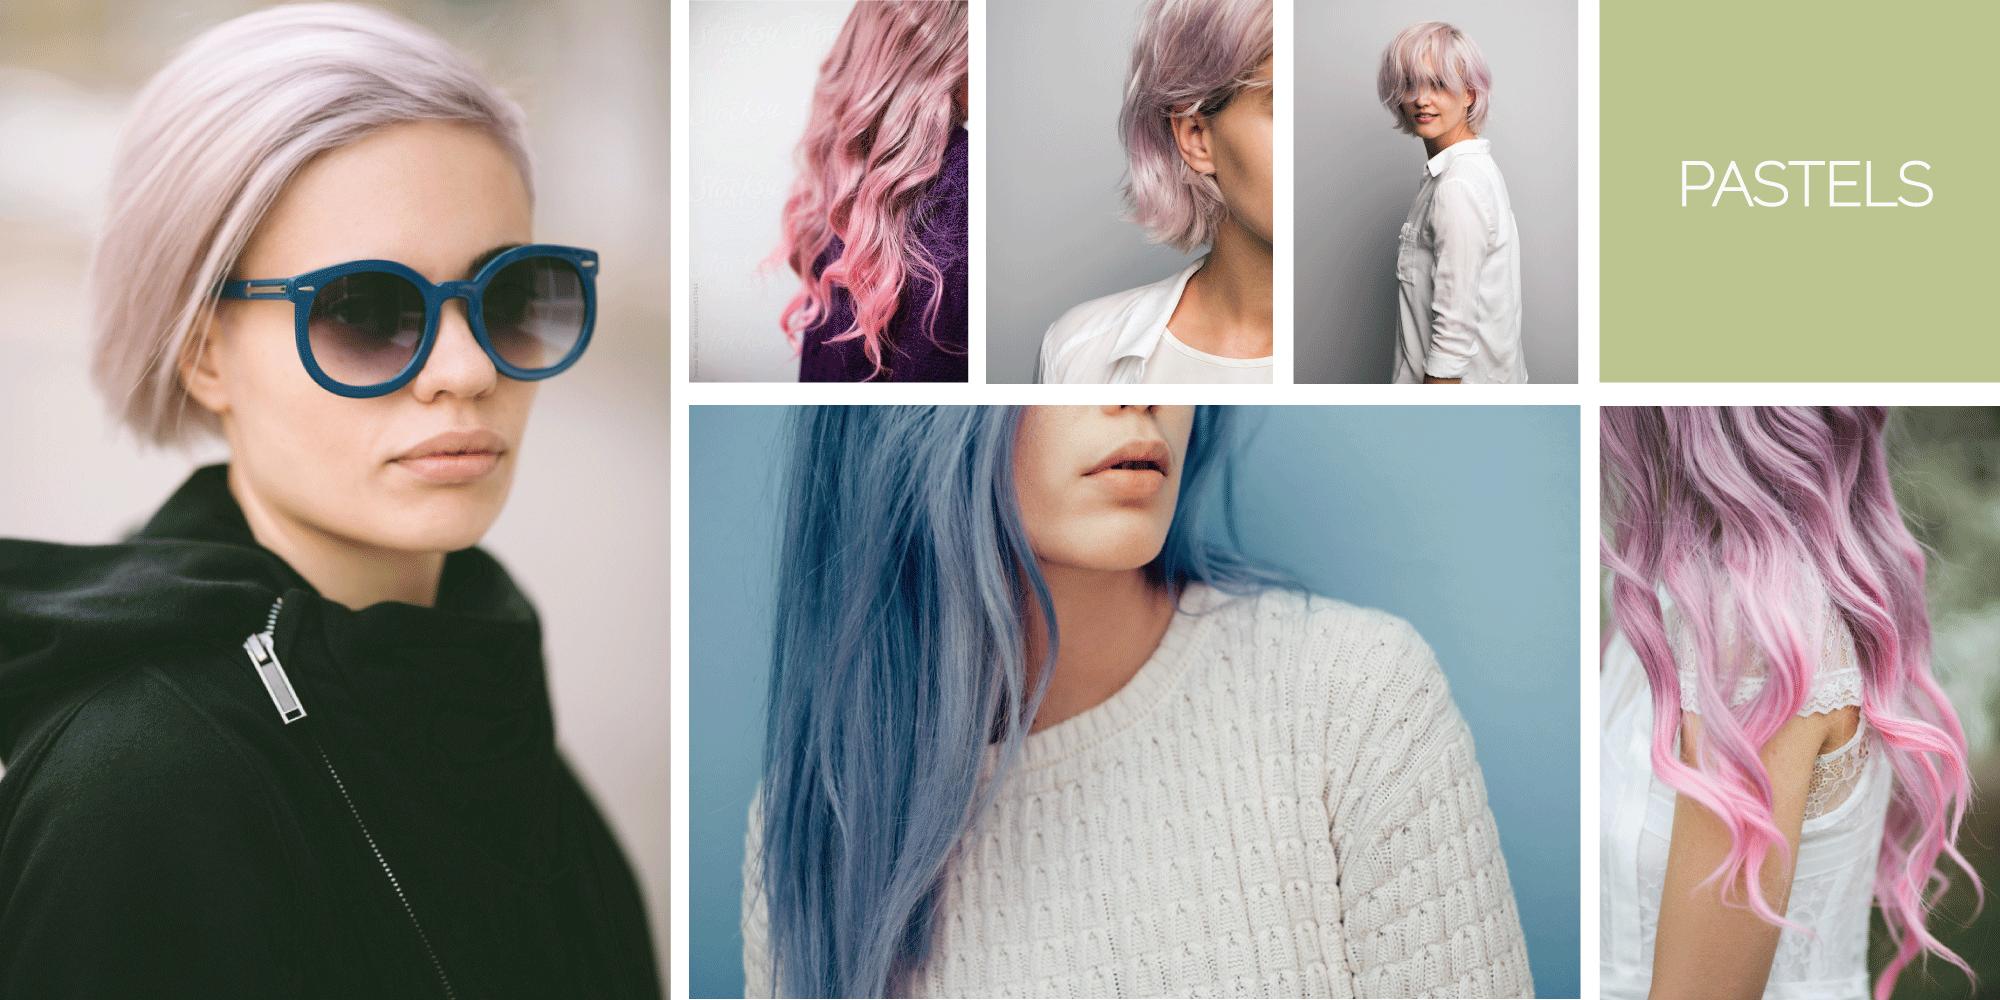 lookbook-pastels.png